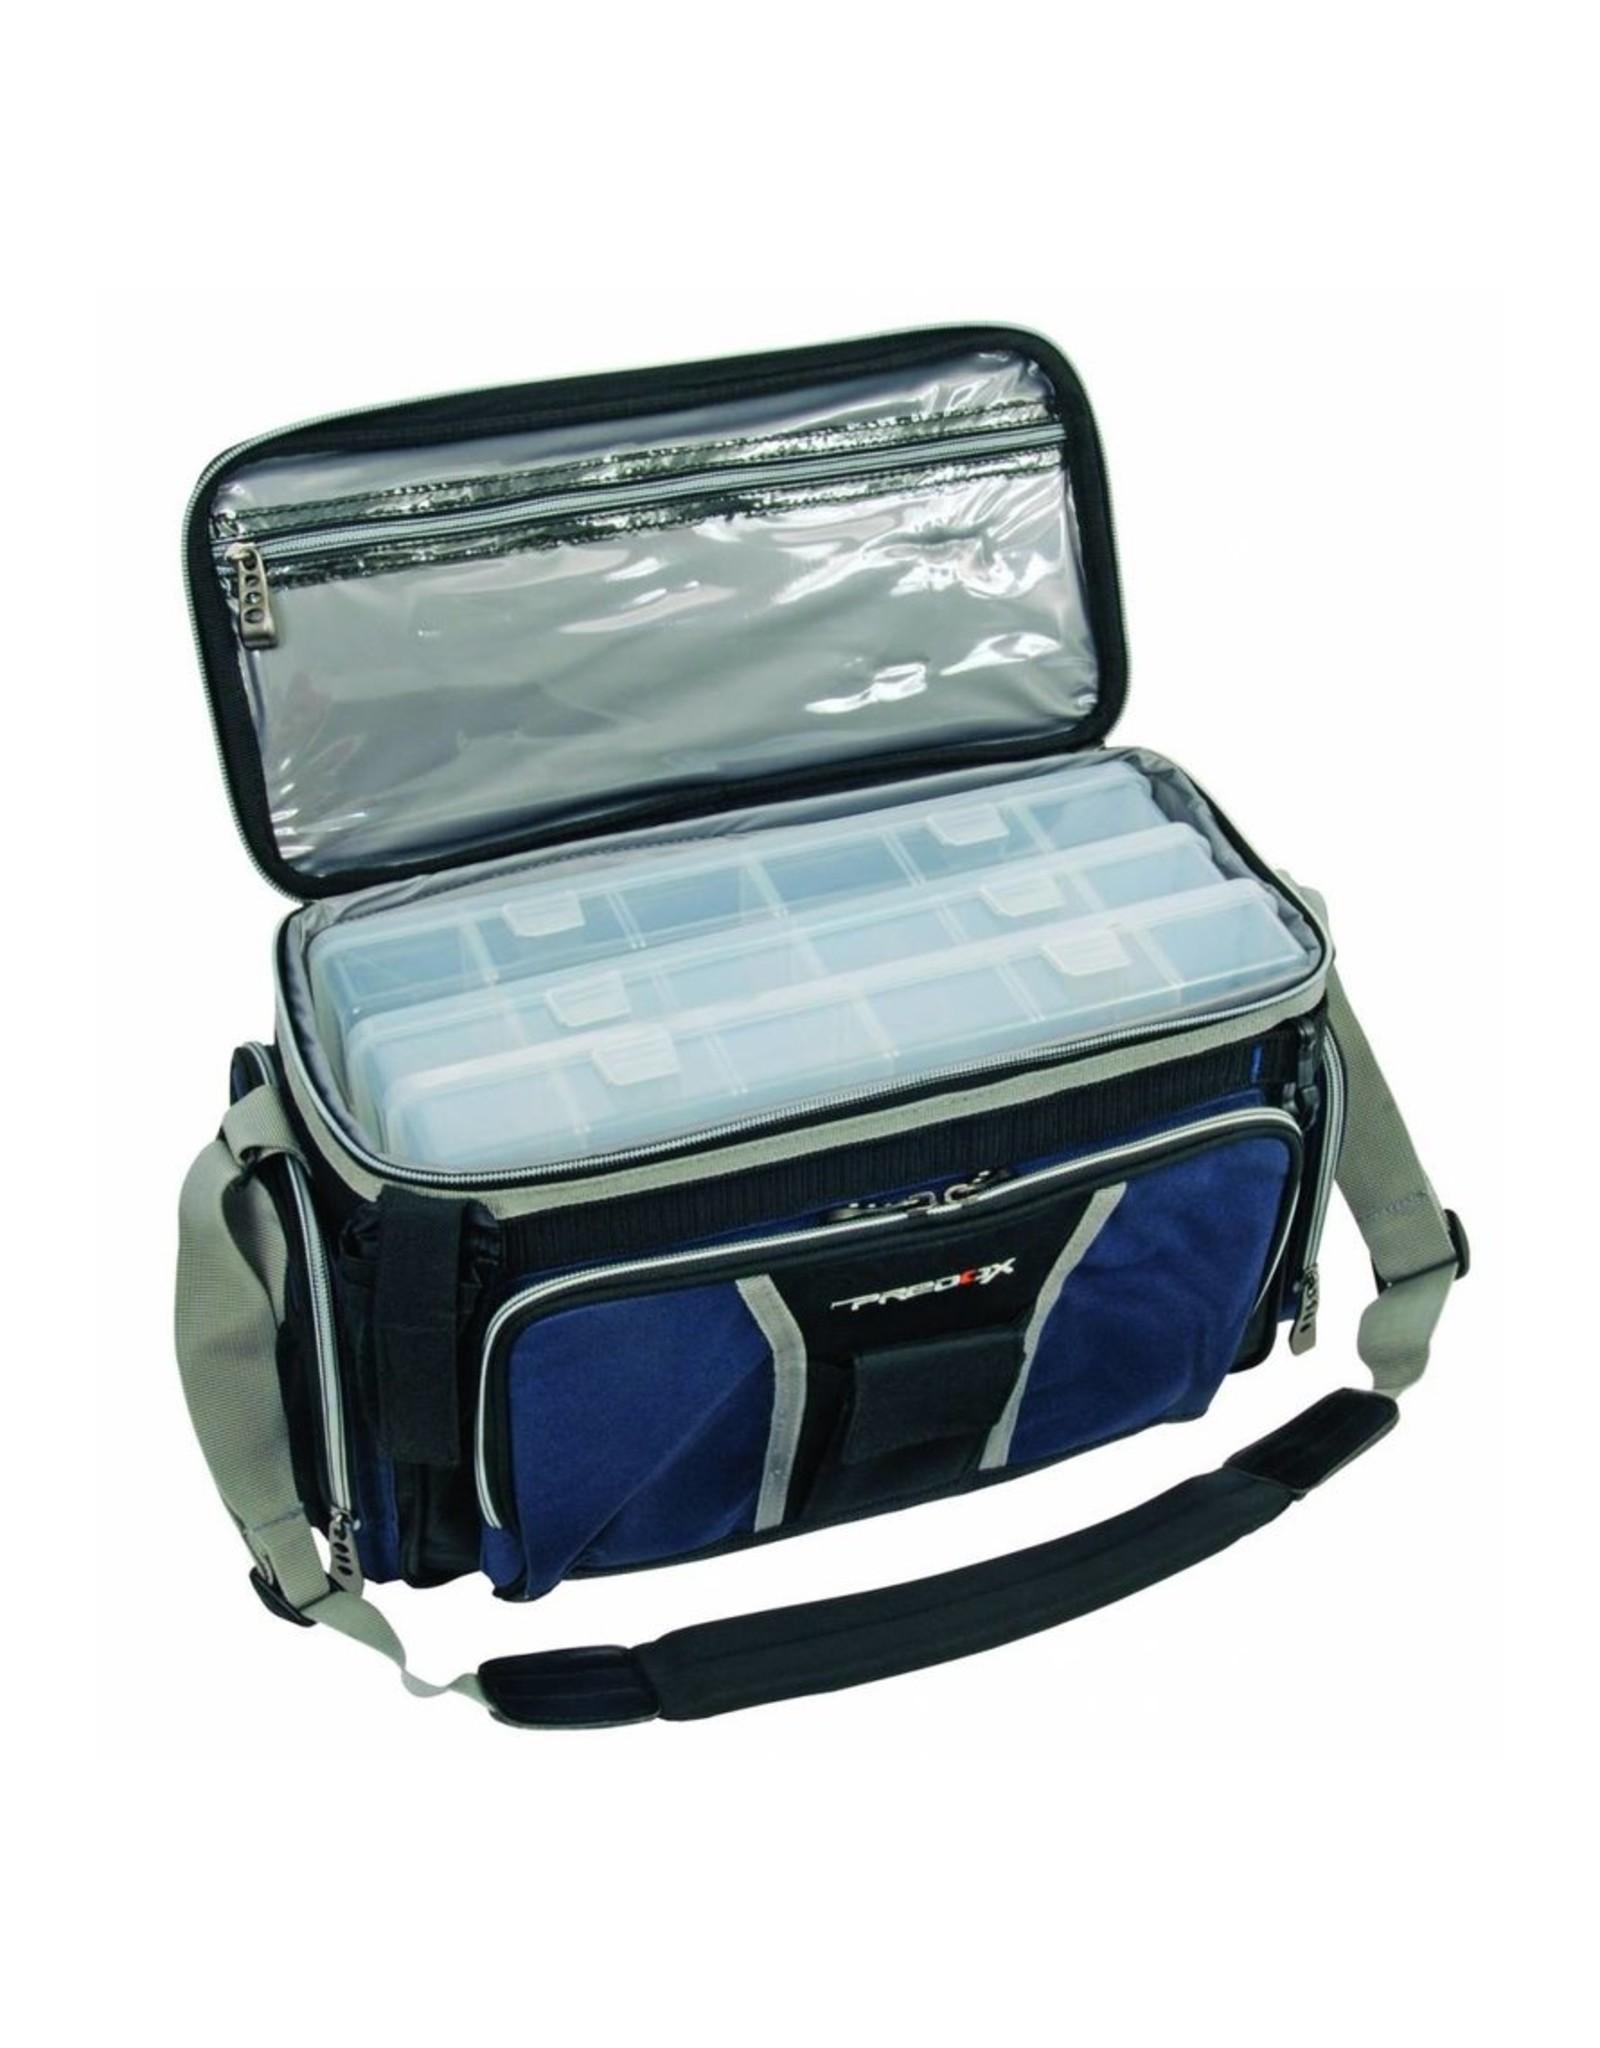 Predox Predox carry all 3 Tainer Bag